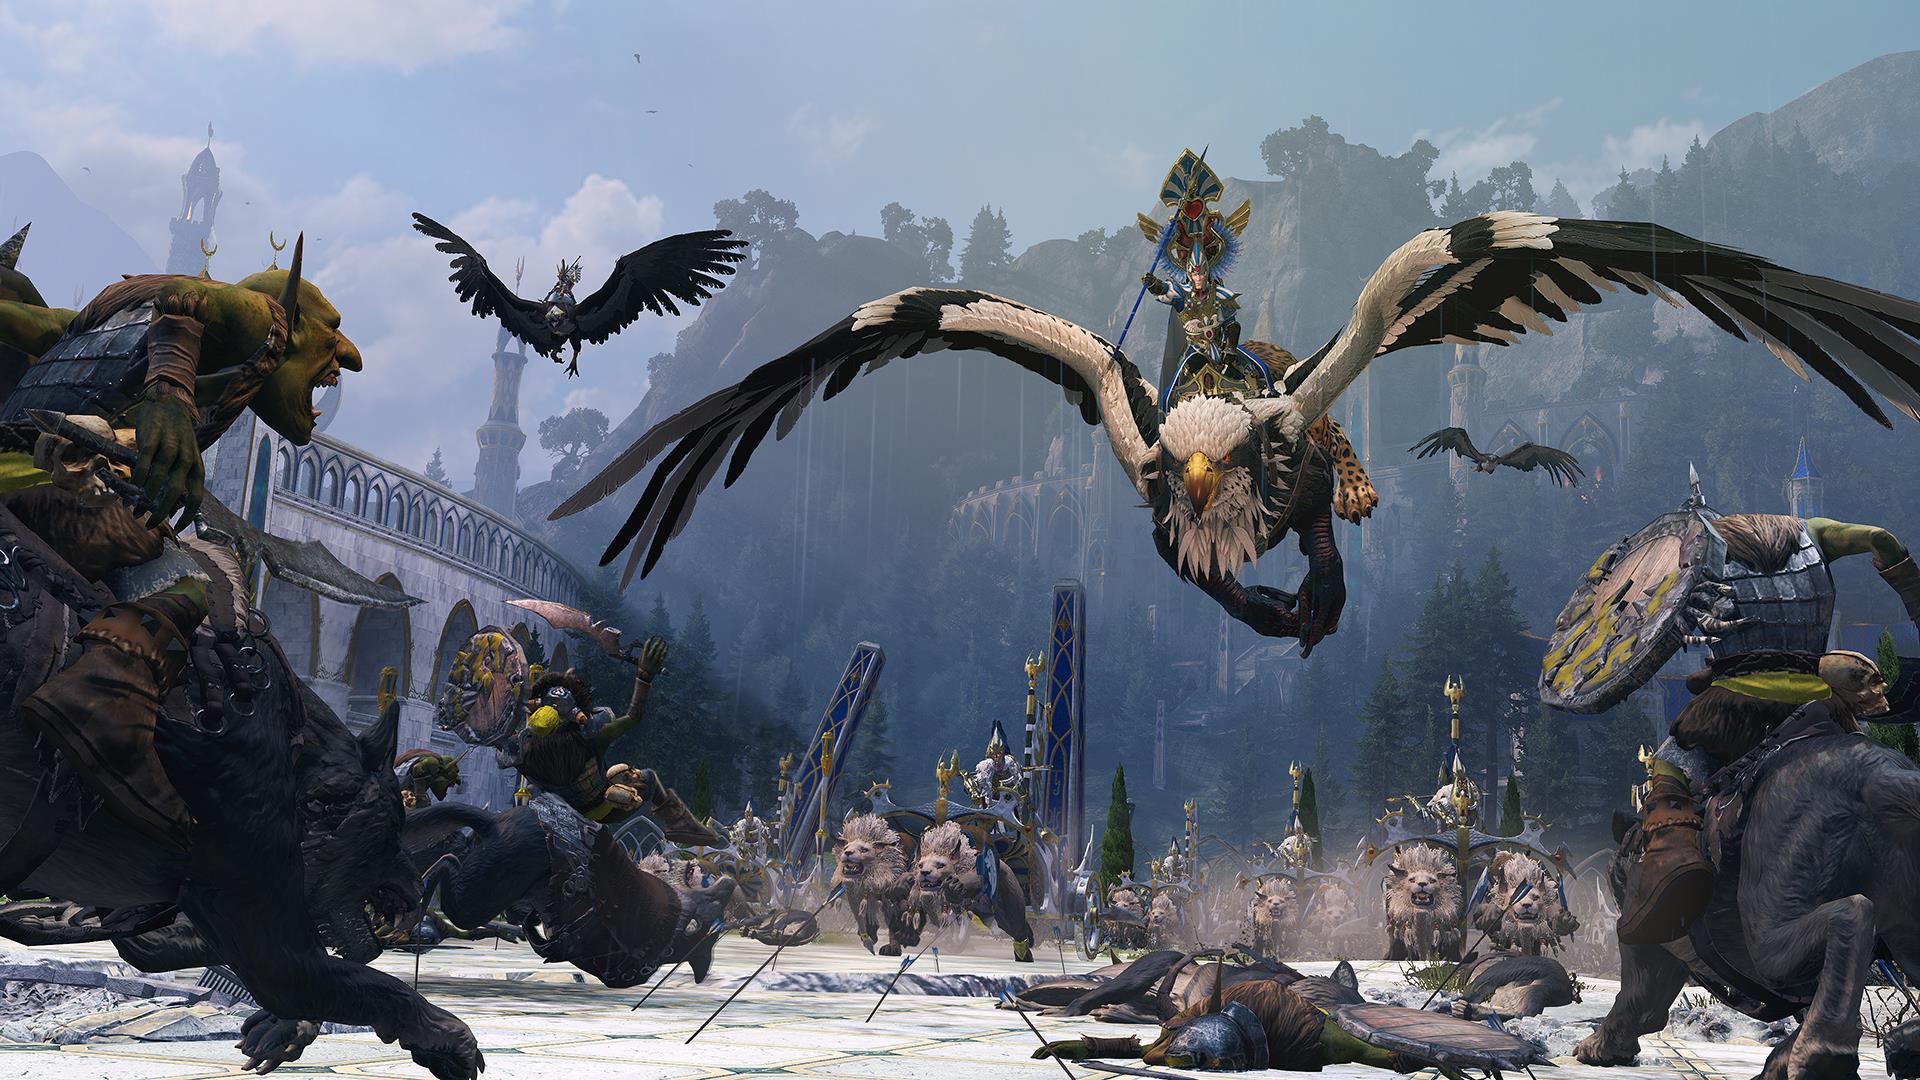 Total War Warhammer Ii Warhammer 2 Eltharion The Grim Unique Items Quest Battles Guide Fangsword Of Eltharion Talisman Of Hoeth